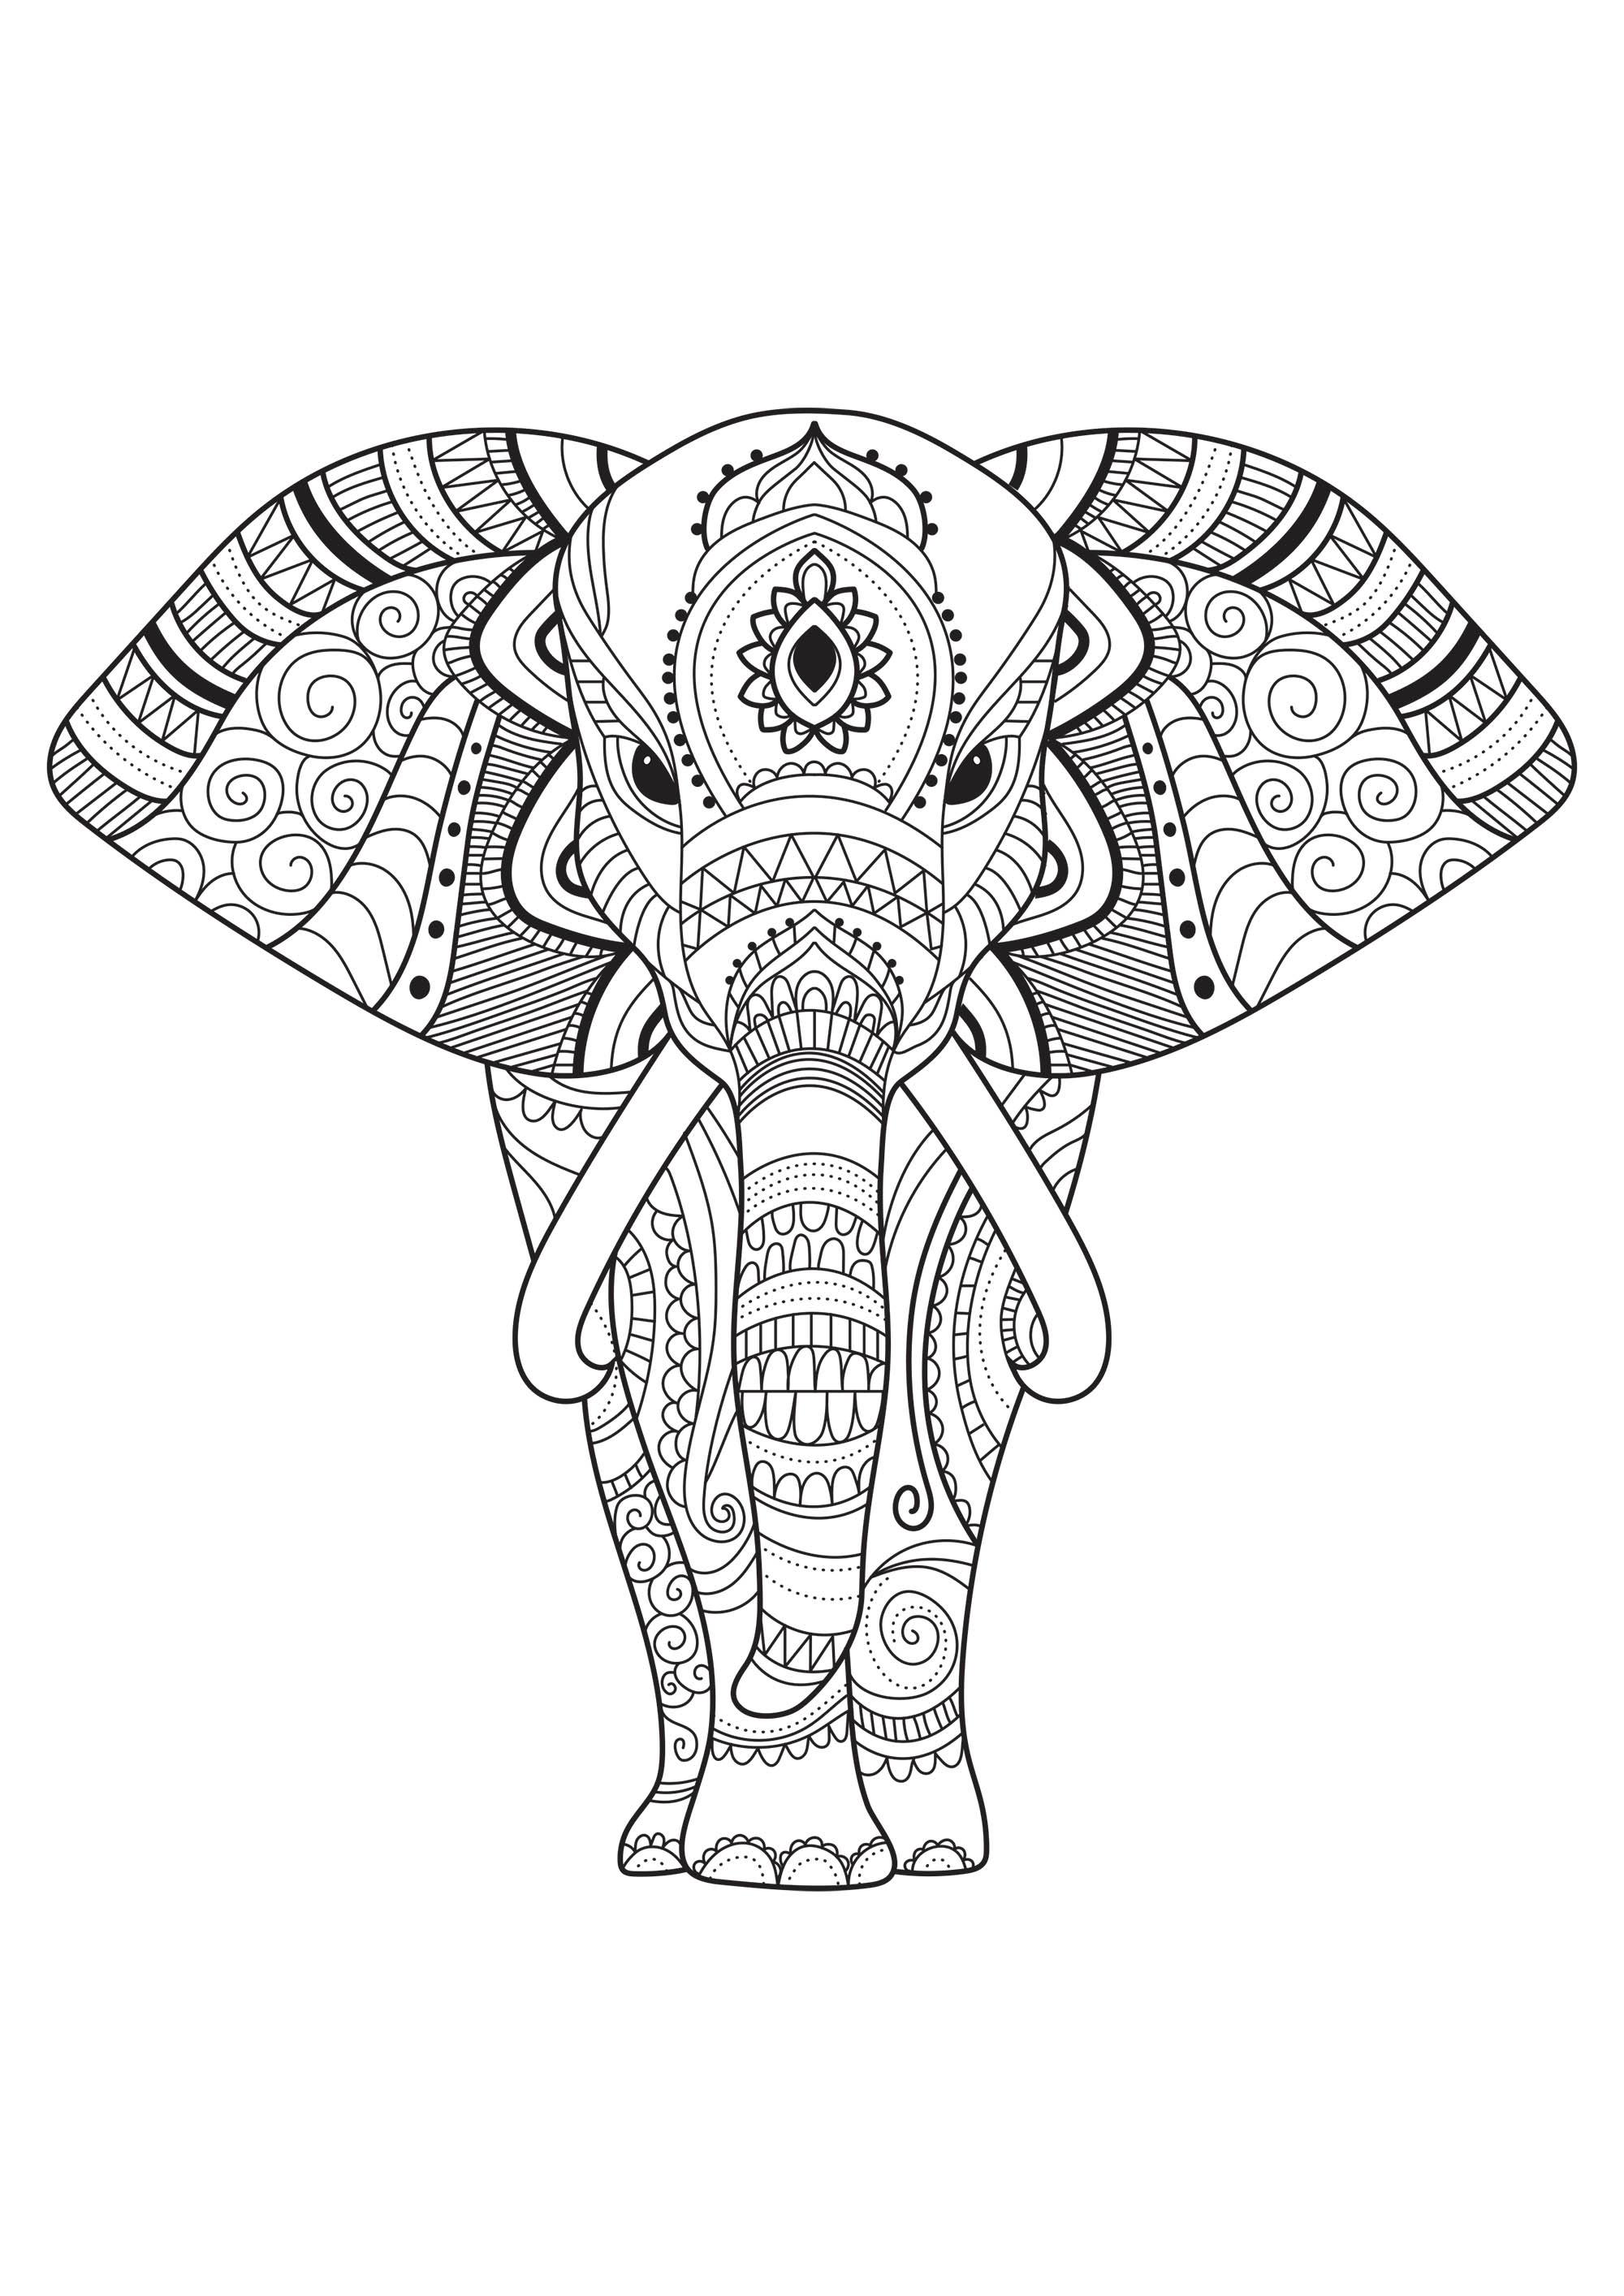 malvorlage erwachsene elefant  28 images  ausmalbilder f